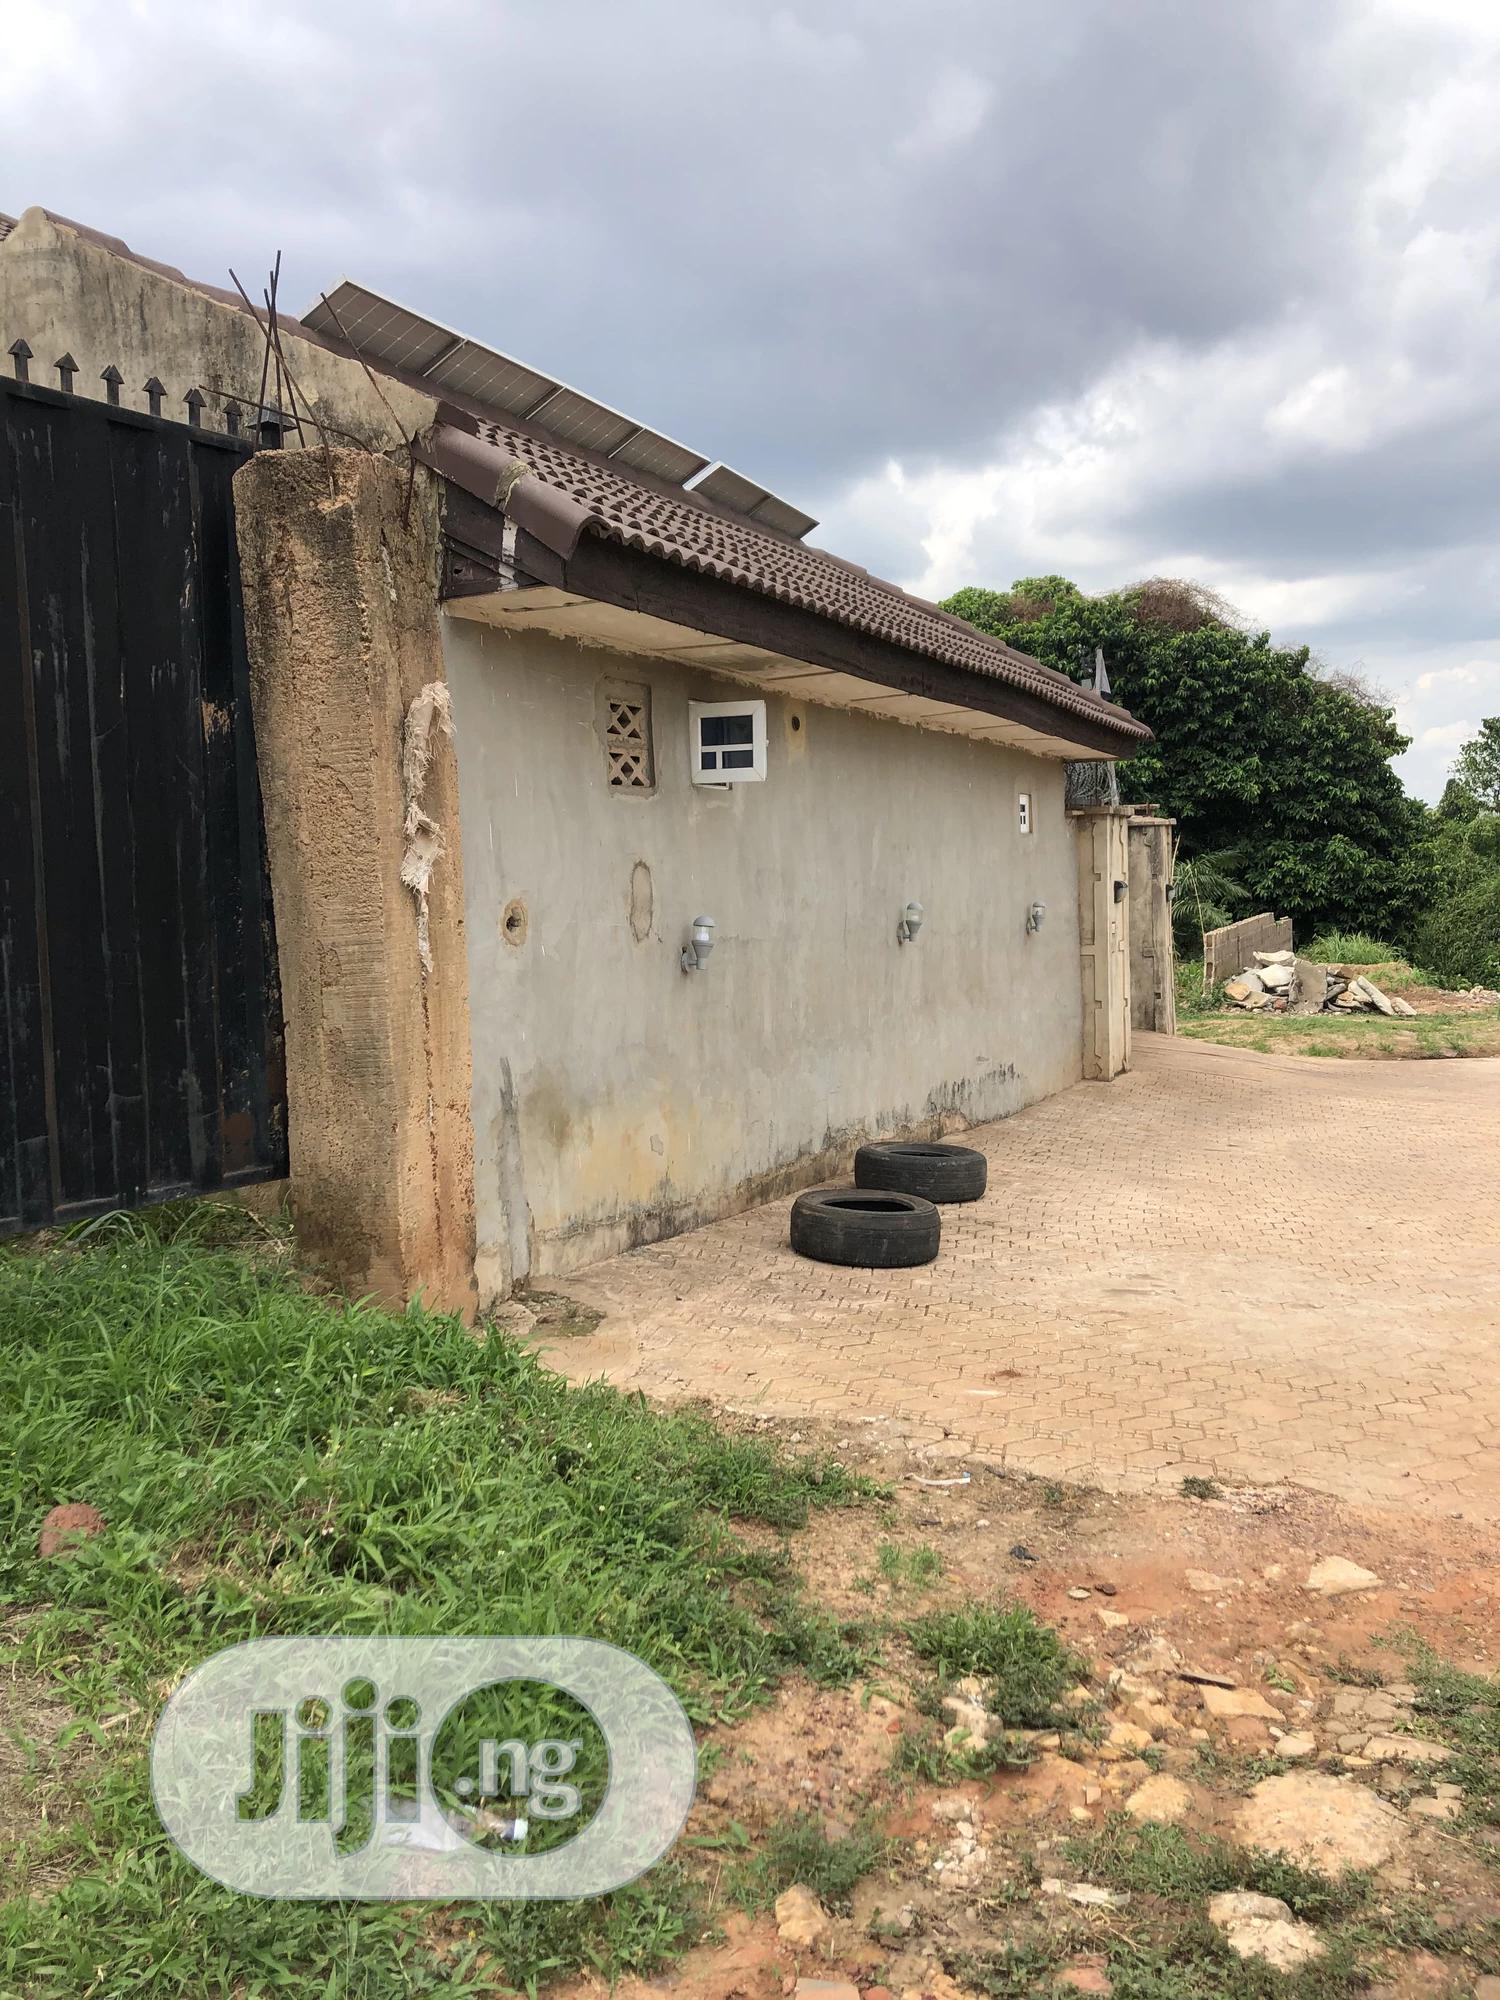 Standard Plot Of Land Fenced & Gated At Golf Estate Close To Major Road | Land & Plots For Sale for sale in Enugu, Enugu State, Nigeria